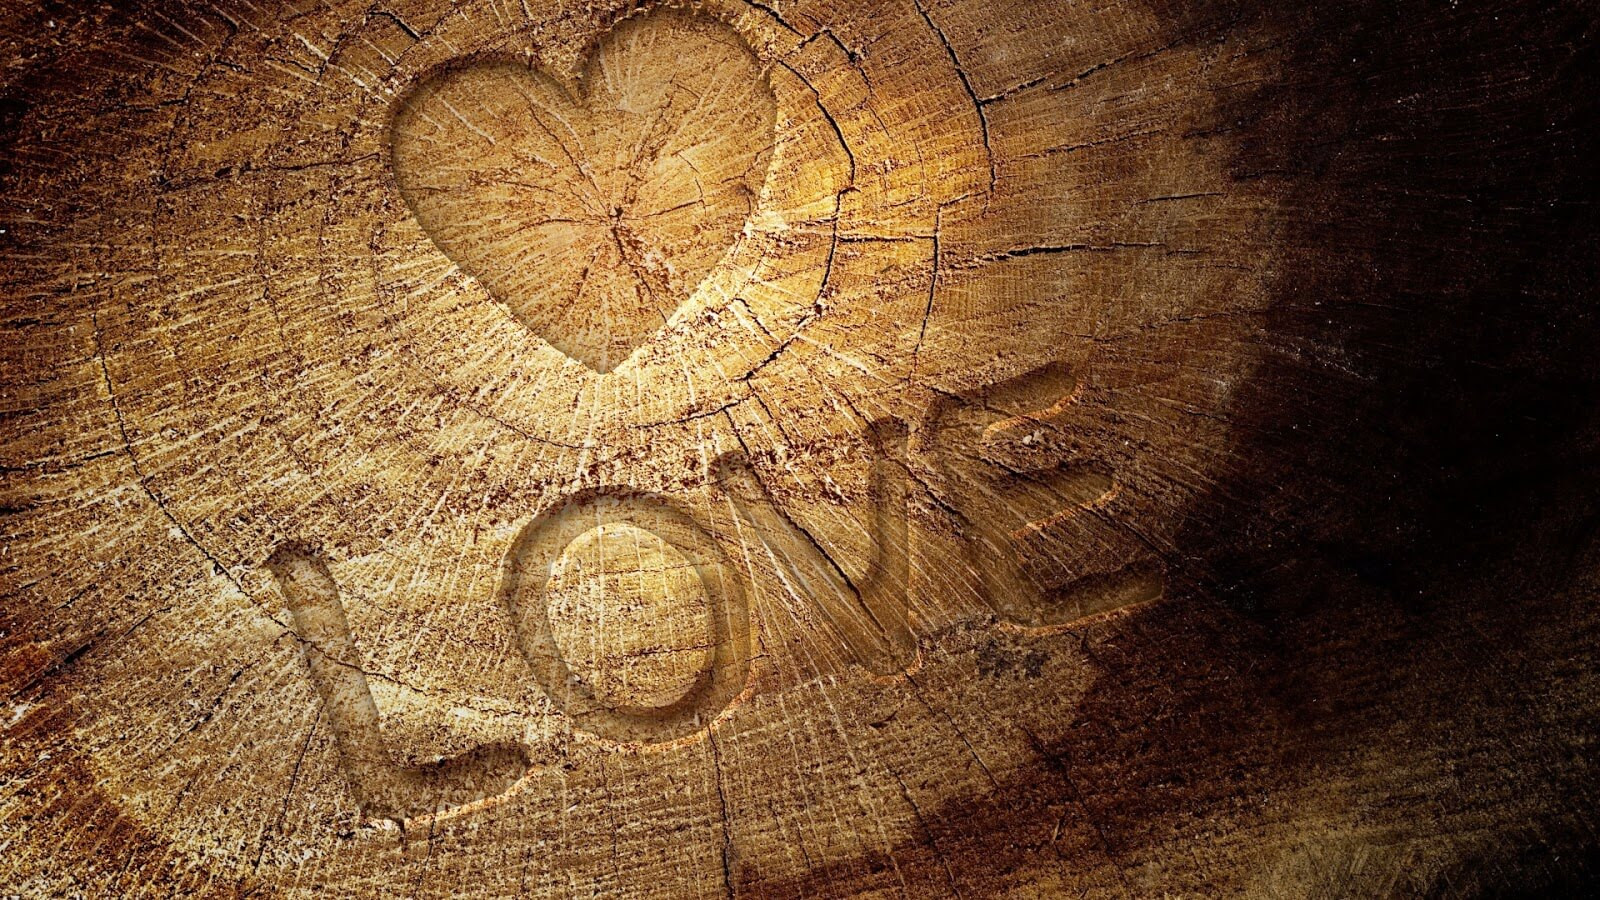 HD Love Wallpapers 1080P {love images} - Gud Tech Tricks